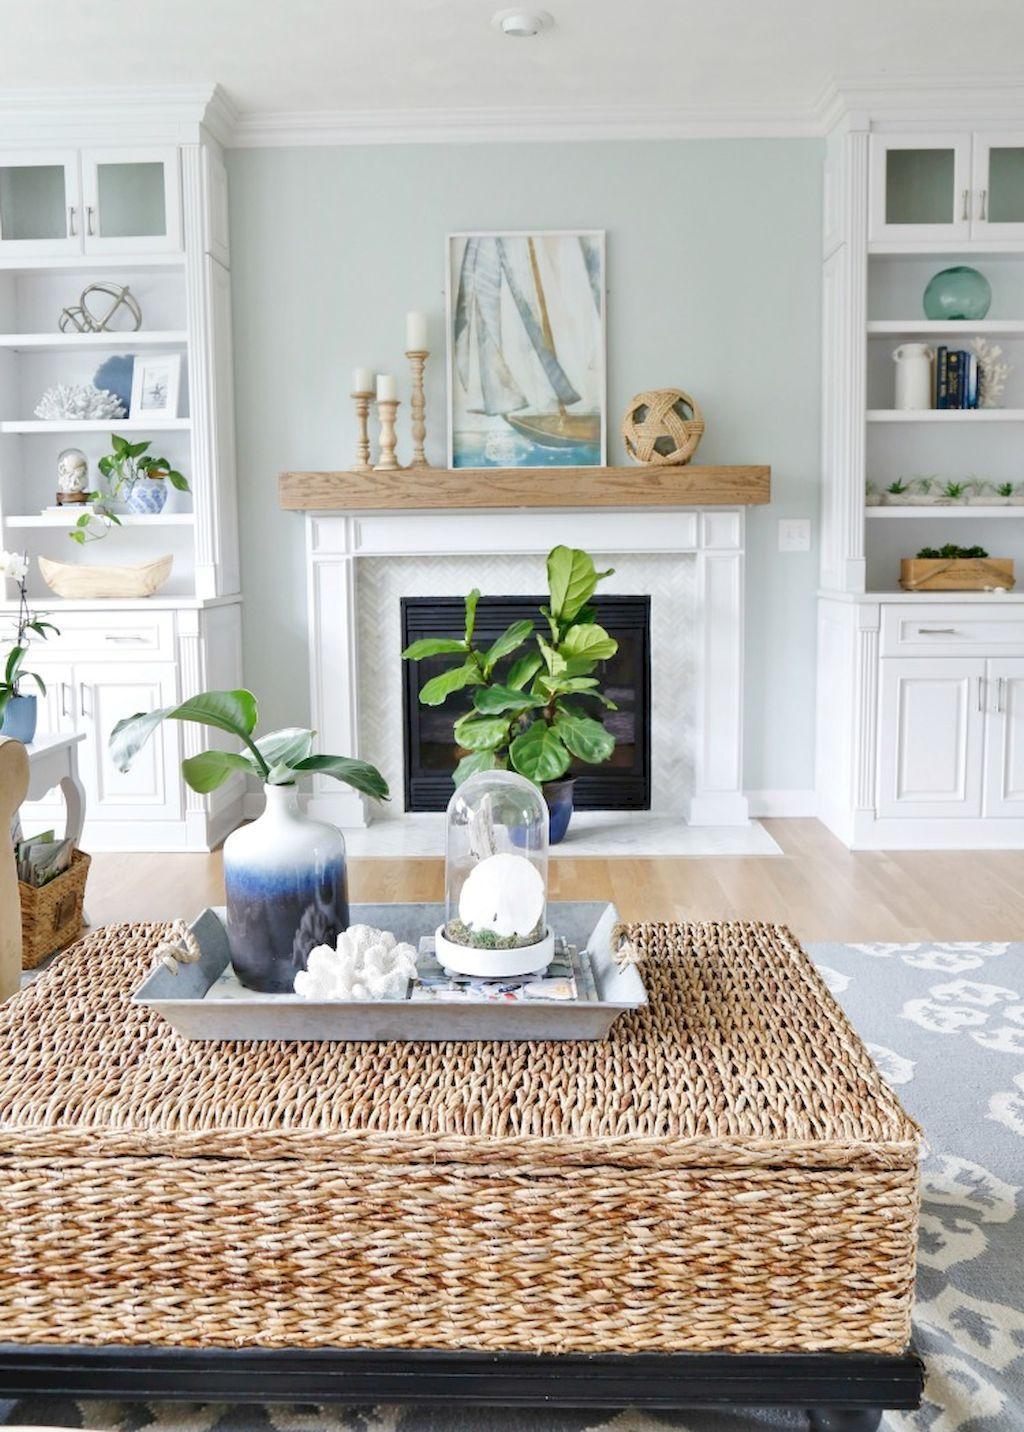 Cool 85 Cozy Coastal Living Room Decorating